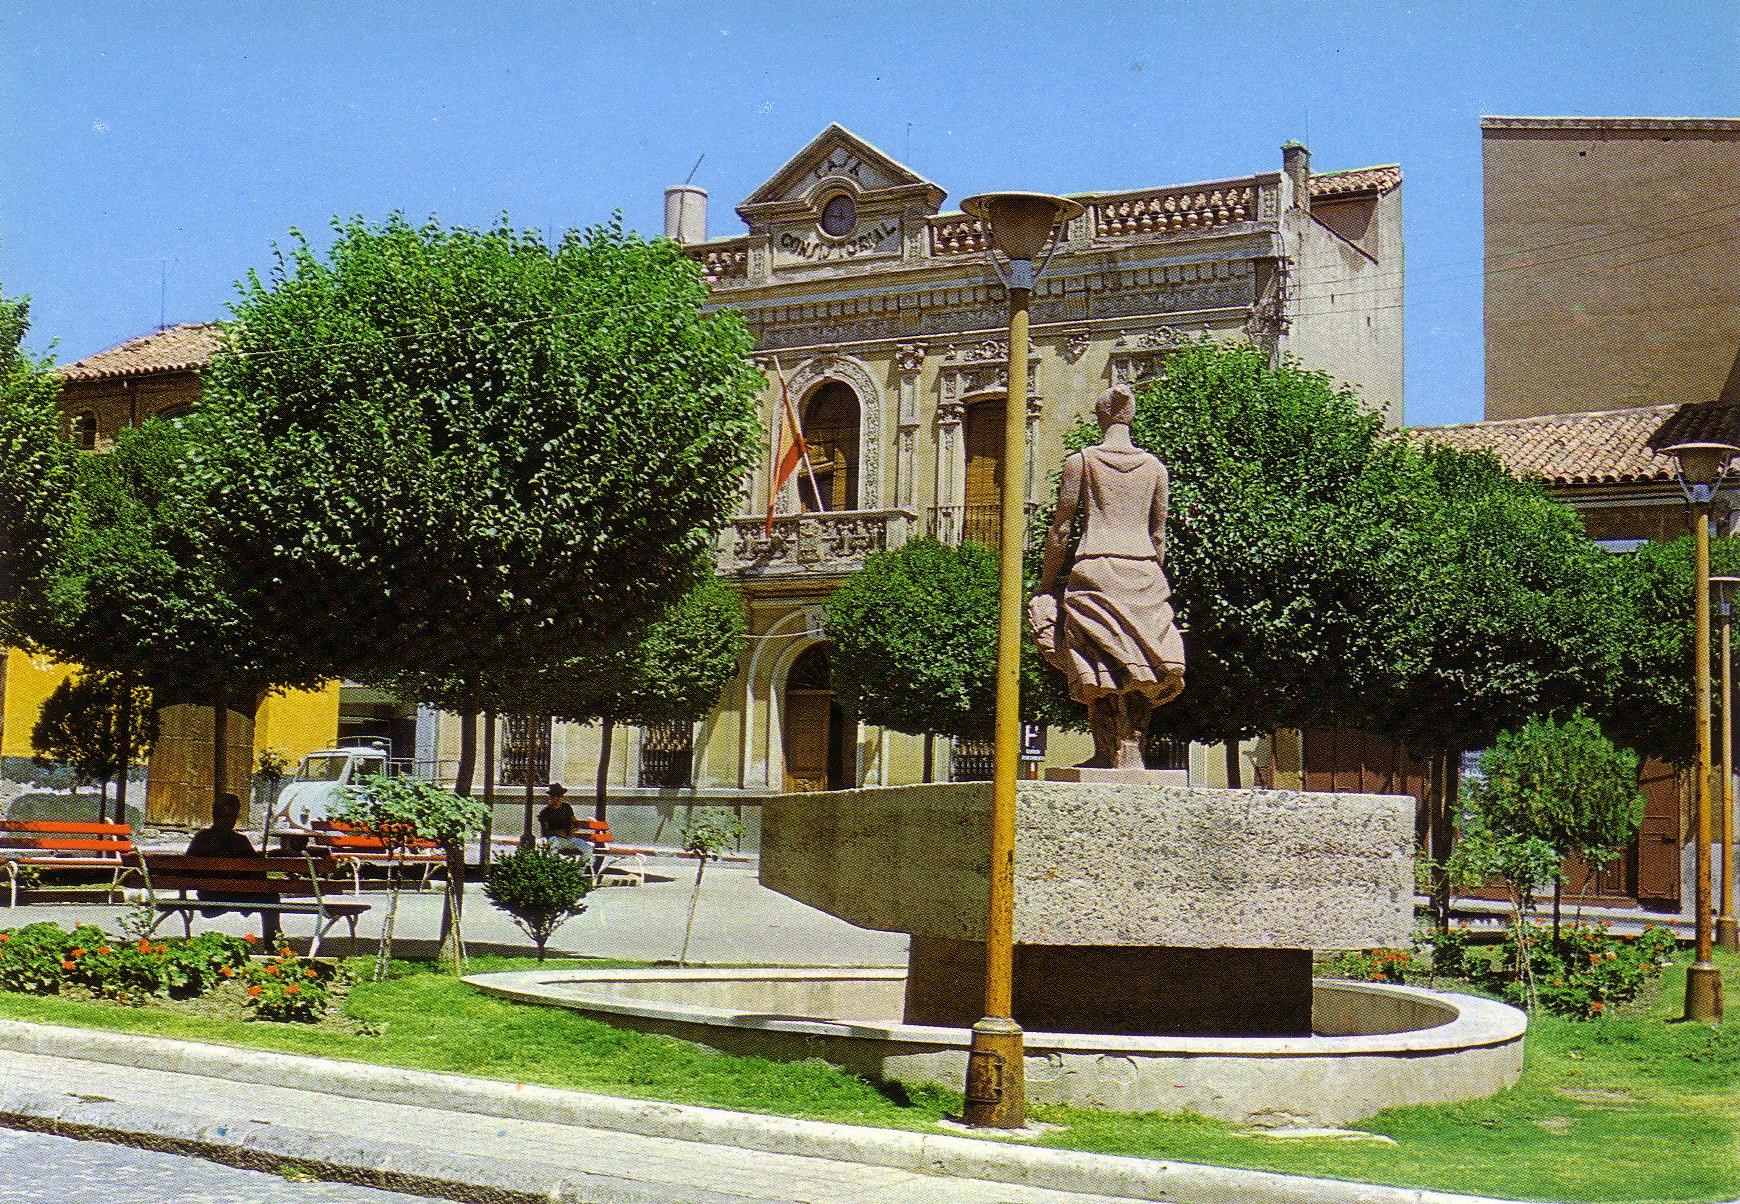 Monumento Héroes Cabañero